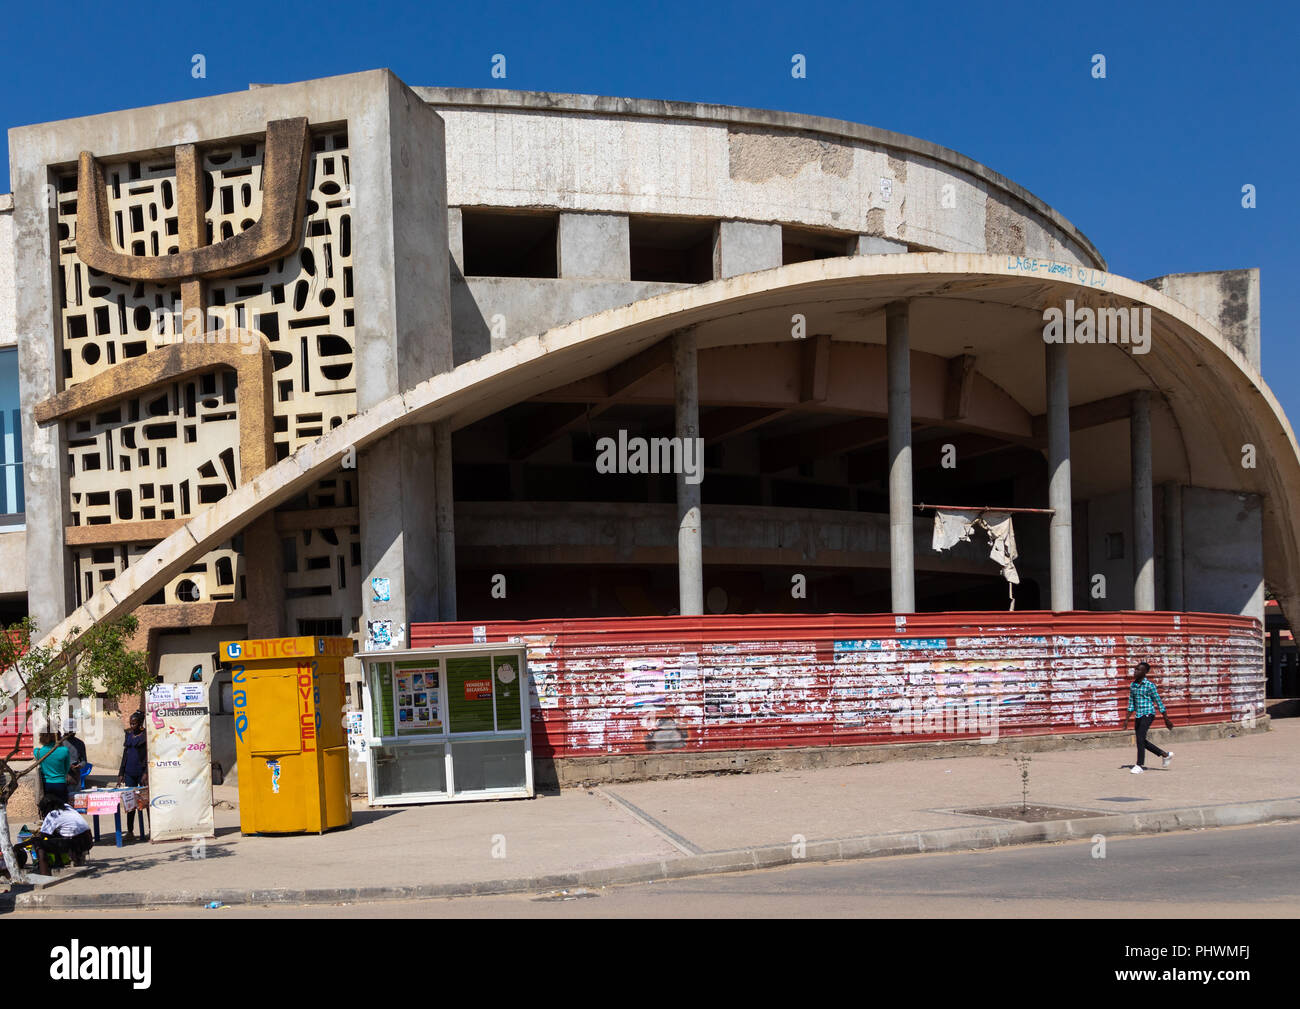 Old portuguese colonial building of the cine teatro Arco Iris, Huila Province, Lubango, Angola Stock Photo